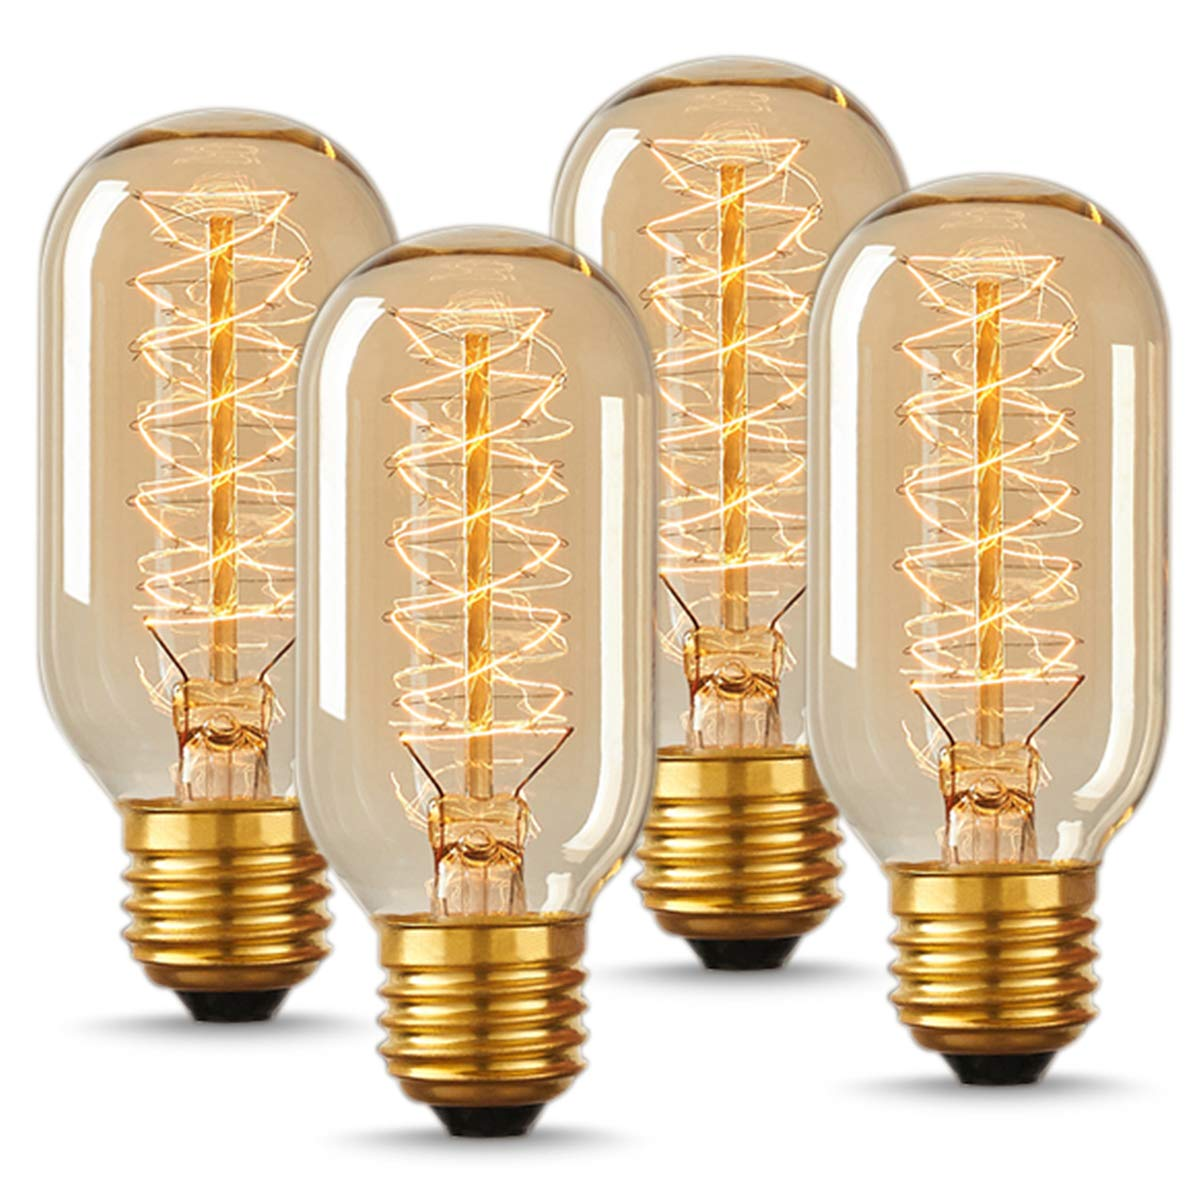 T45 Vintage Edison LED Bulb, DORESshop Antique Tubular Style Incandescent Bulb, Warm White, Amber Glass, 110-130 Volts, E26 Medium Base Lamp for Home Light Fixtures Decorative, No Dimmable(4 Pack)